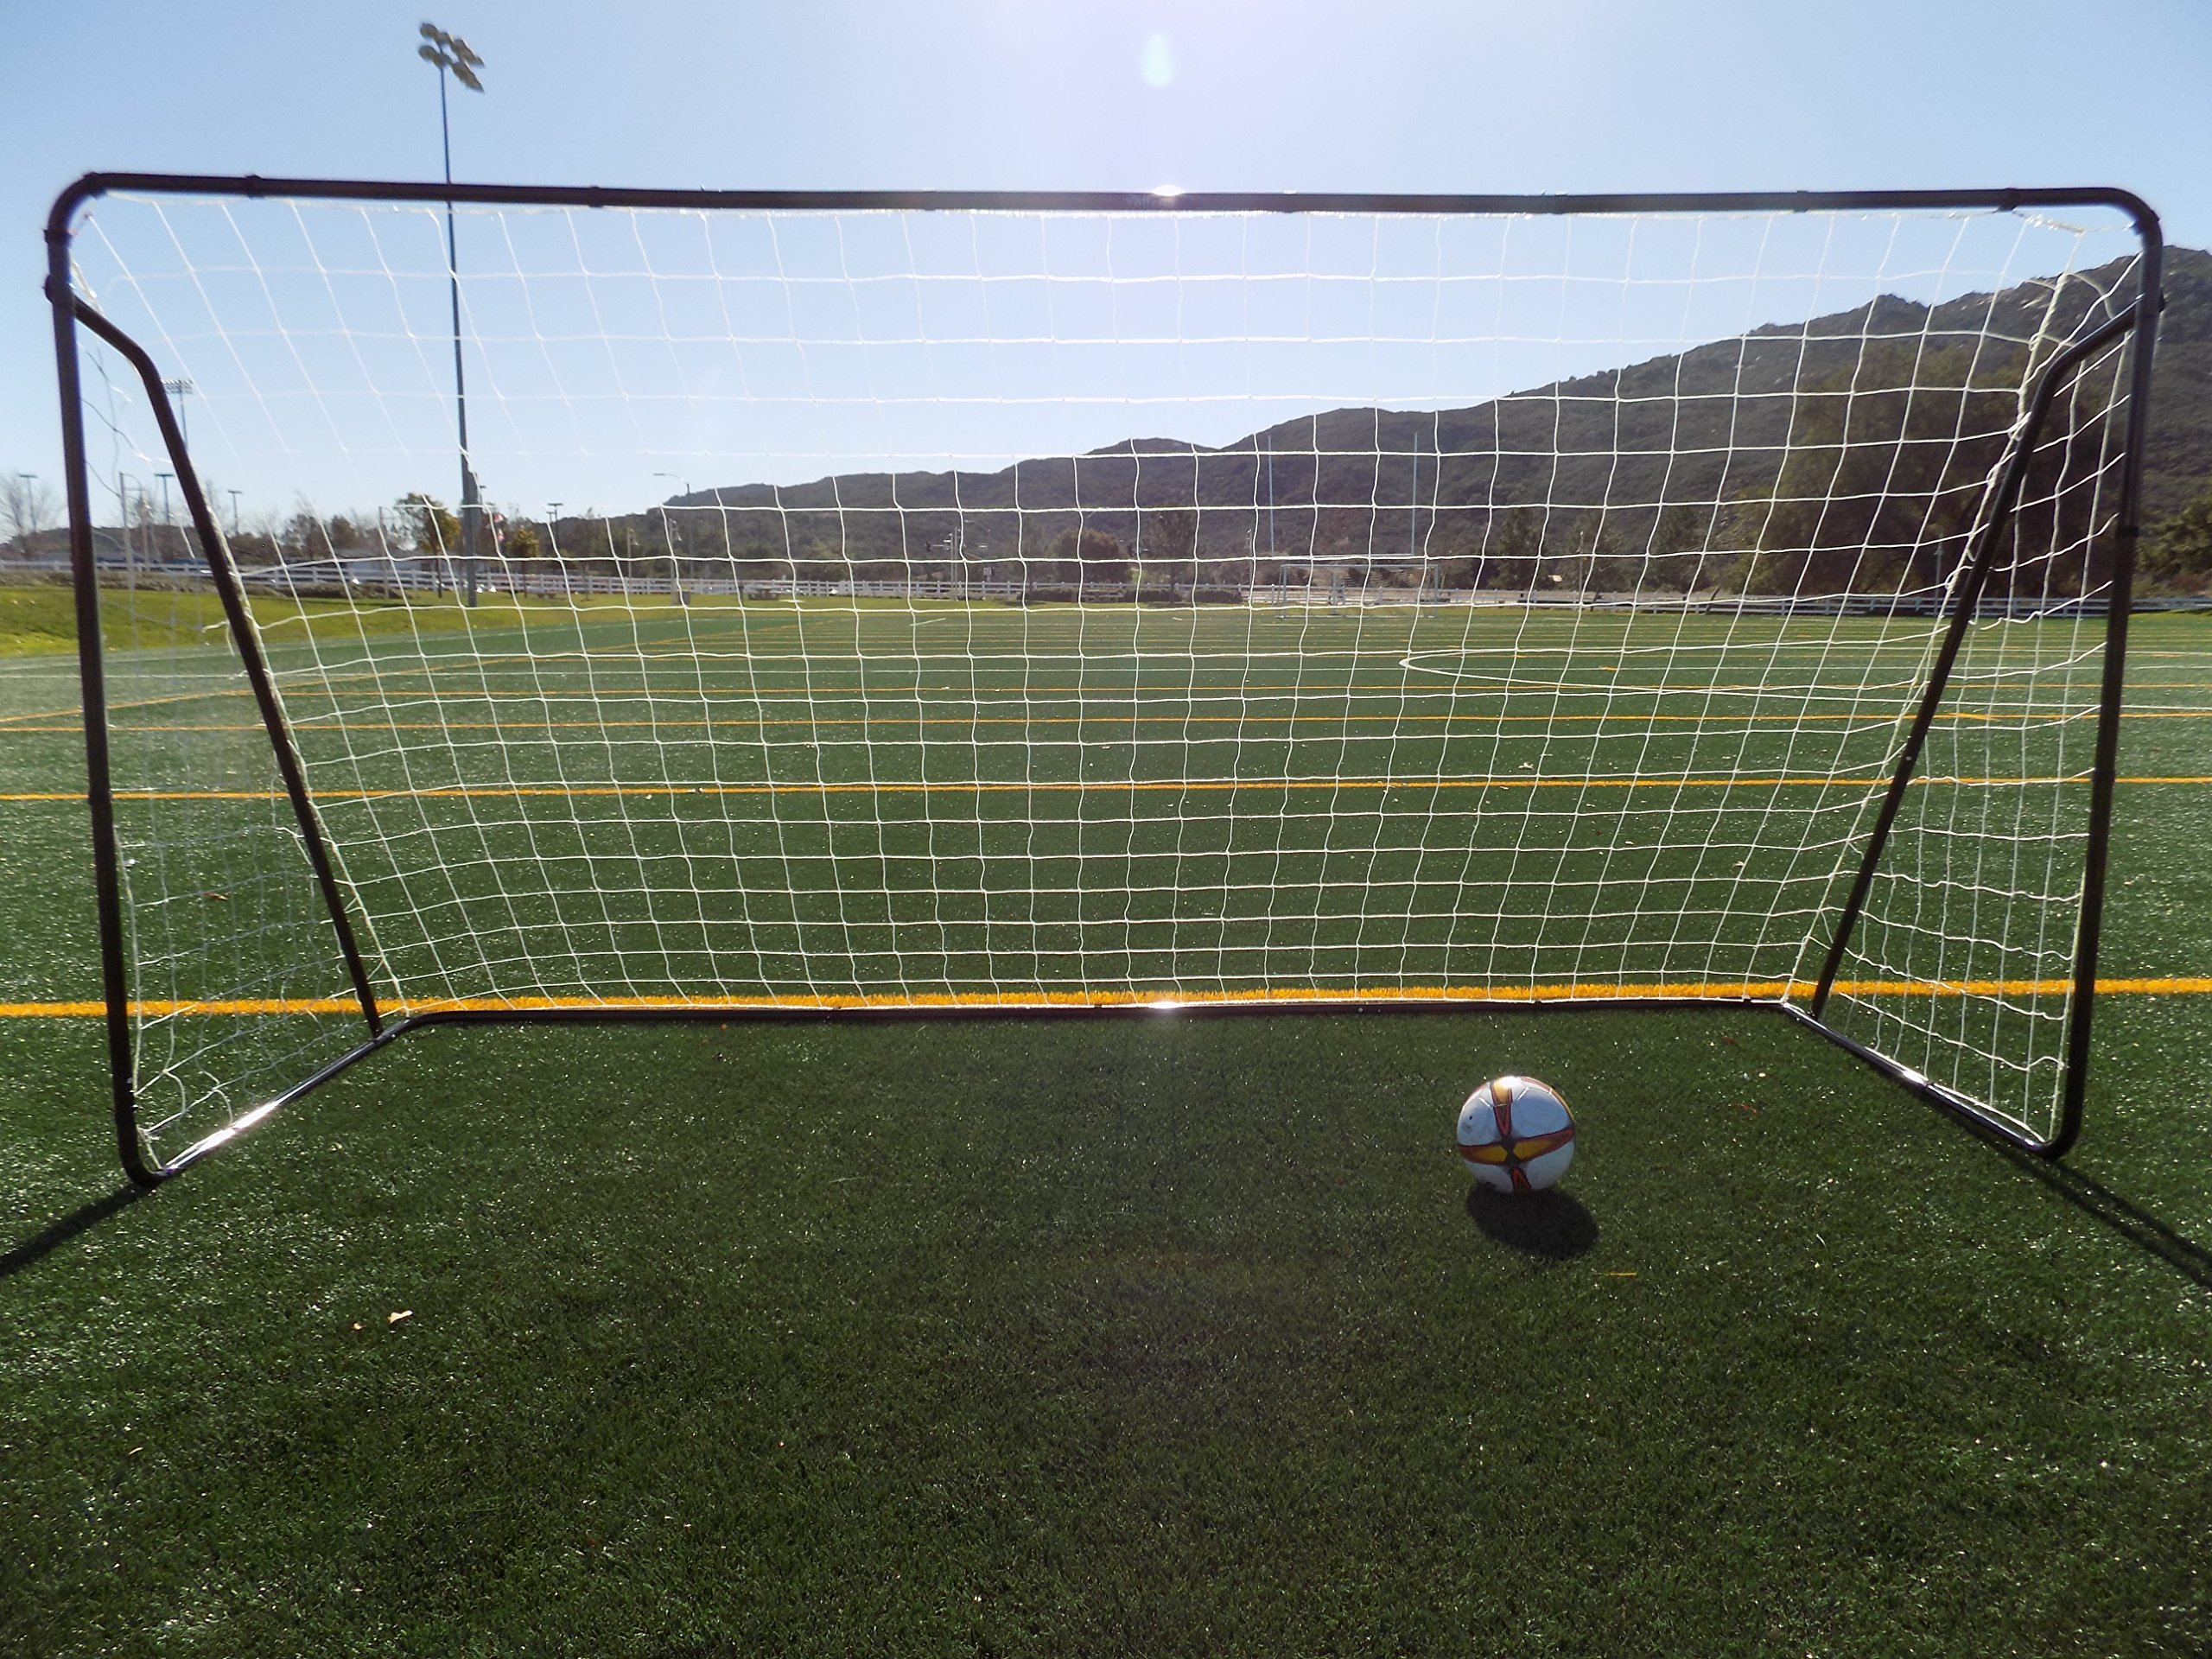 Vallerta 12 x 6 Ft. Powder Coated Galvanized Steel Soccer ...